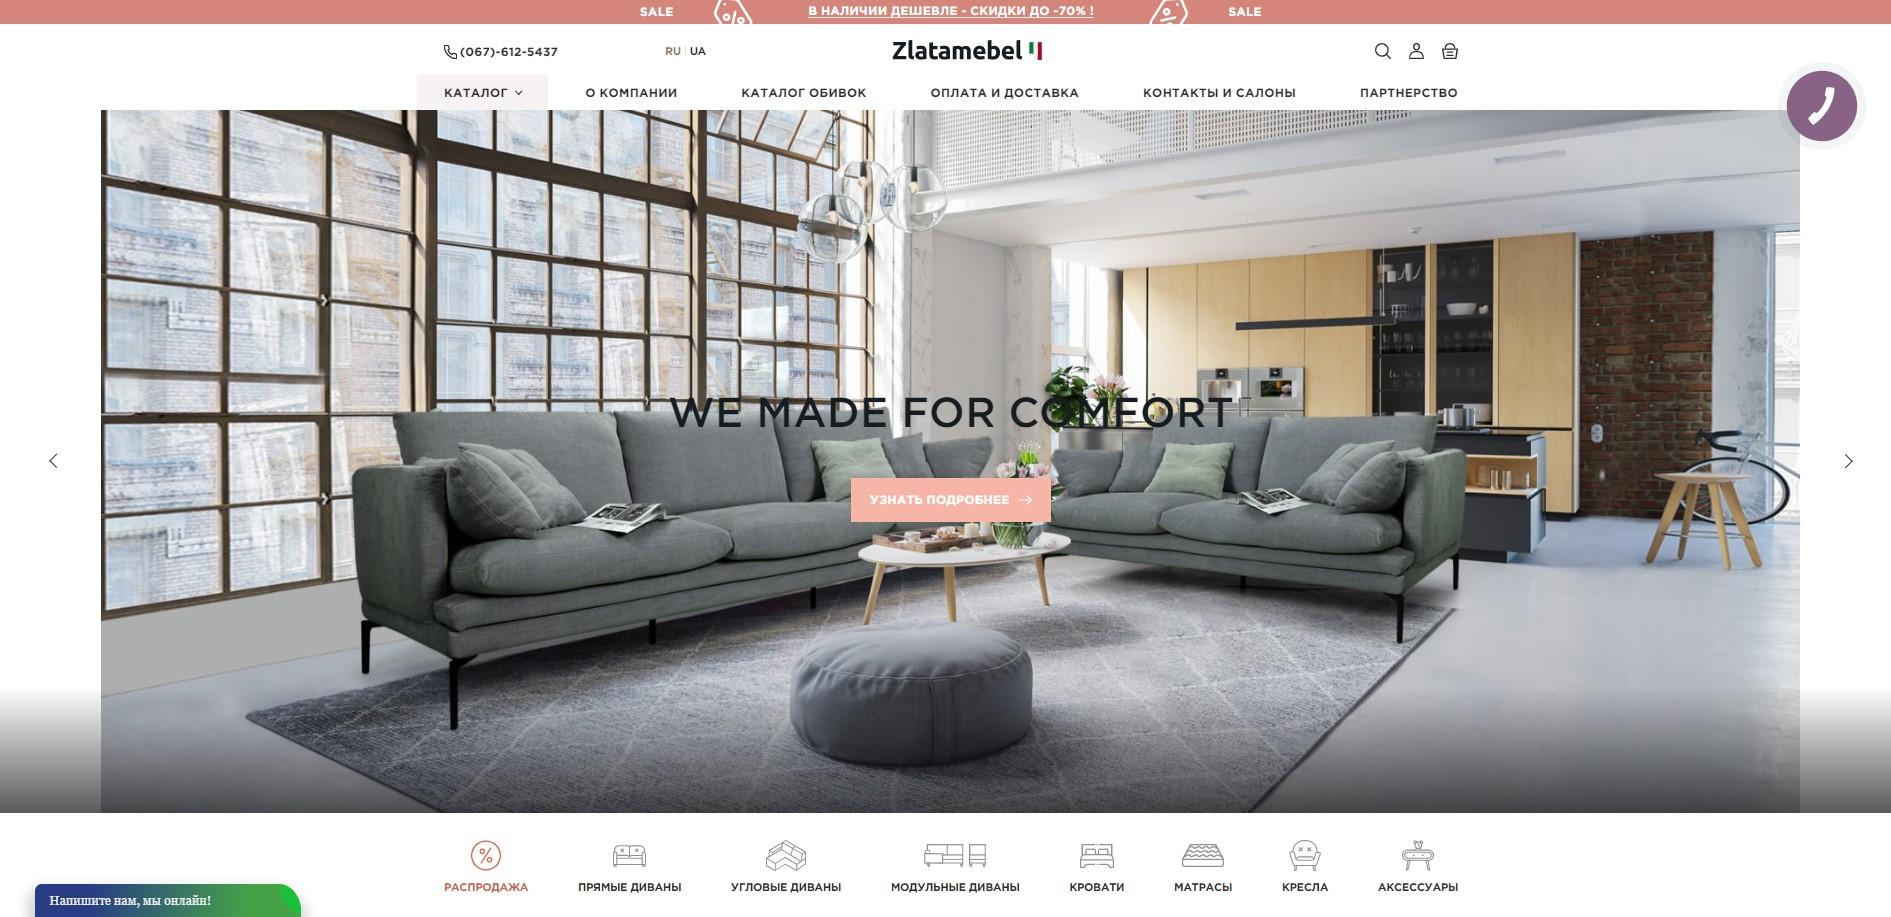 Корпоративный сайт с каталогом Zlatamebel